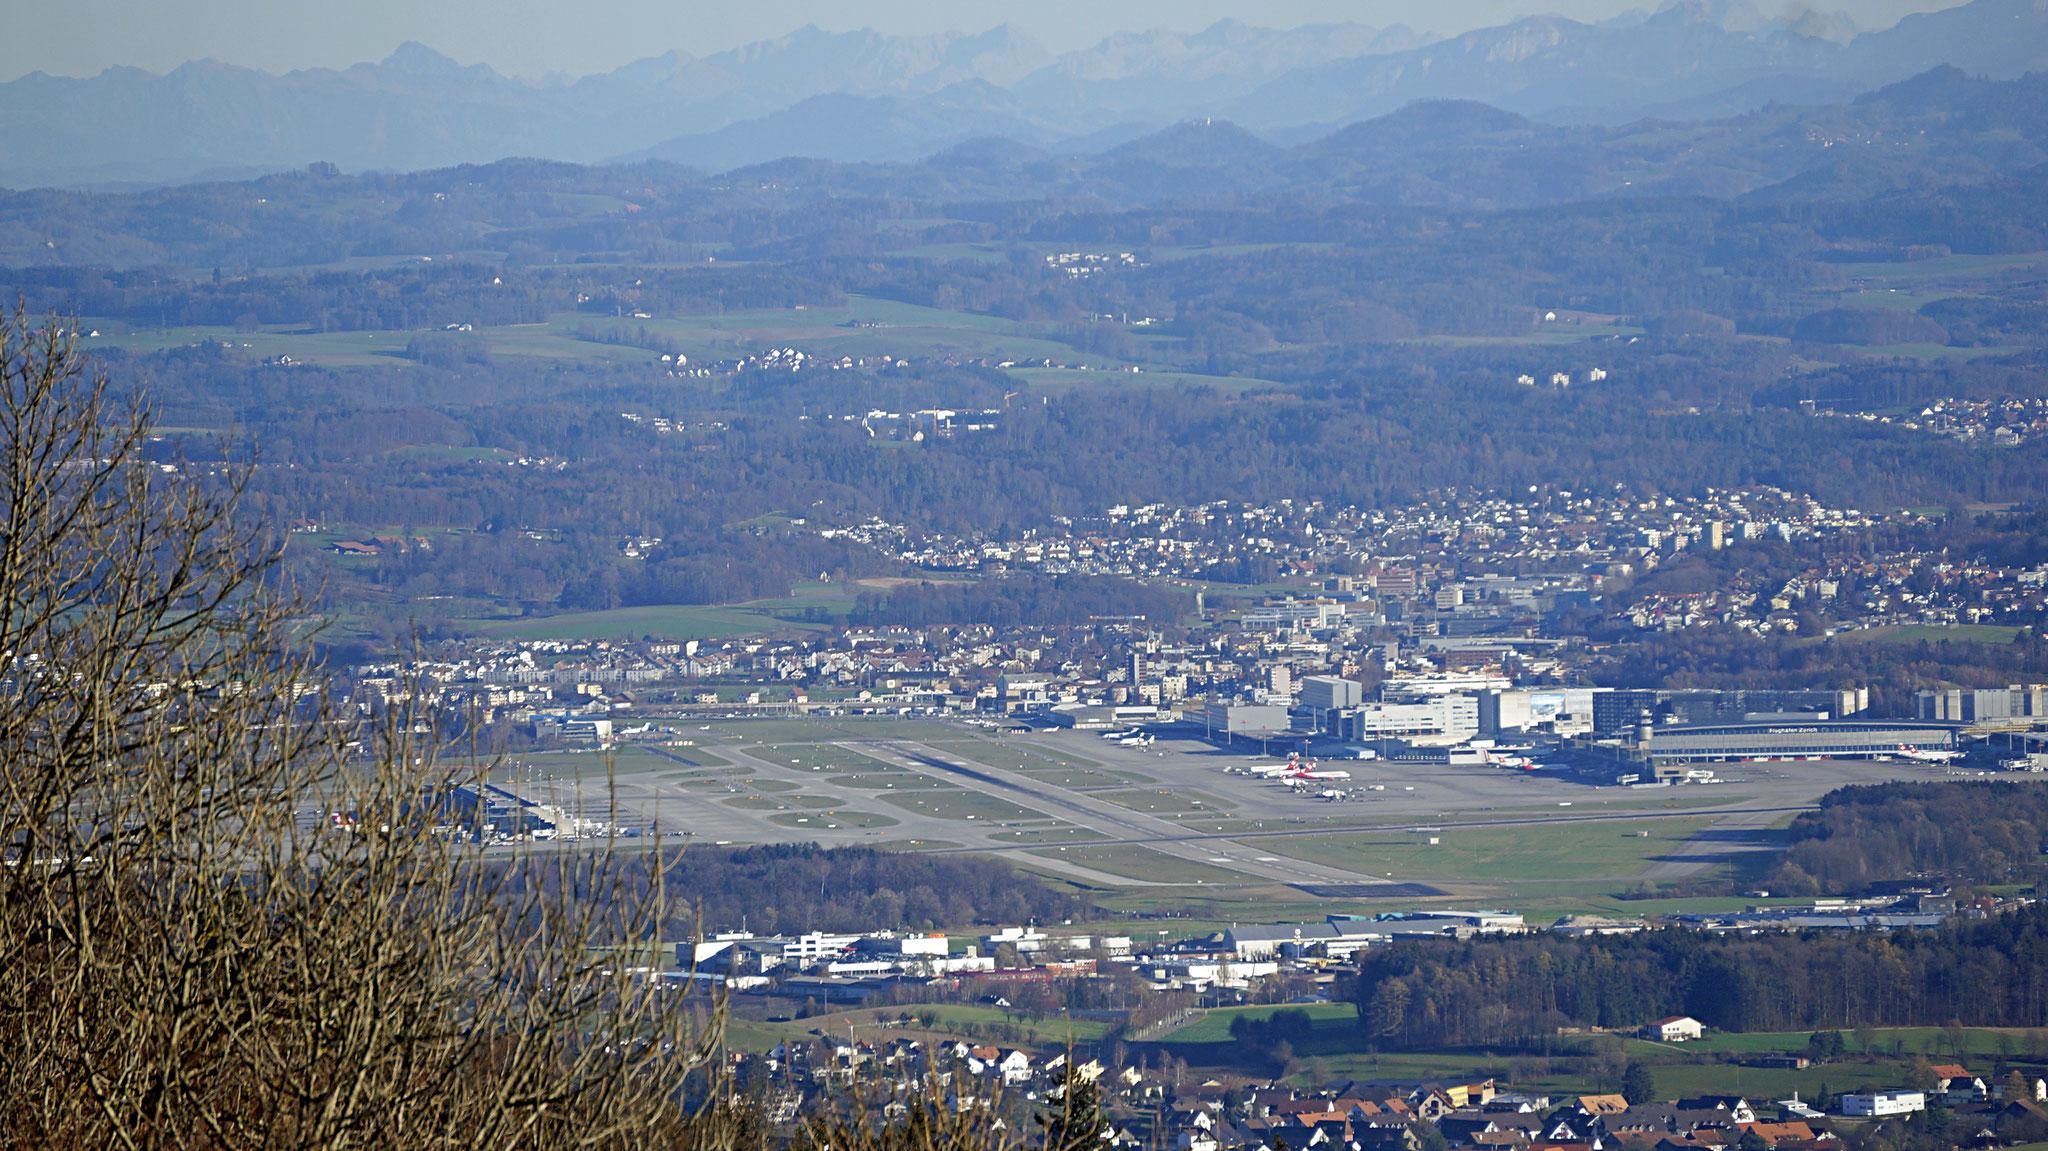 18.11.2015::Richtung Flugplatz Zürich